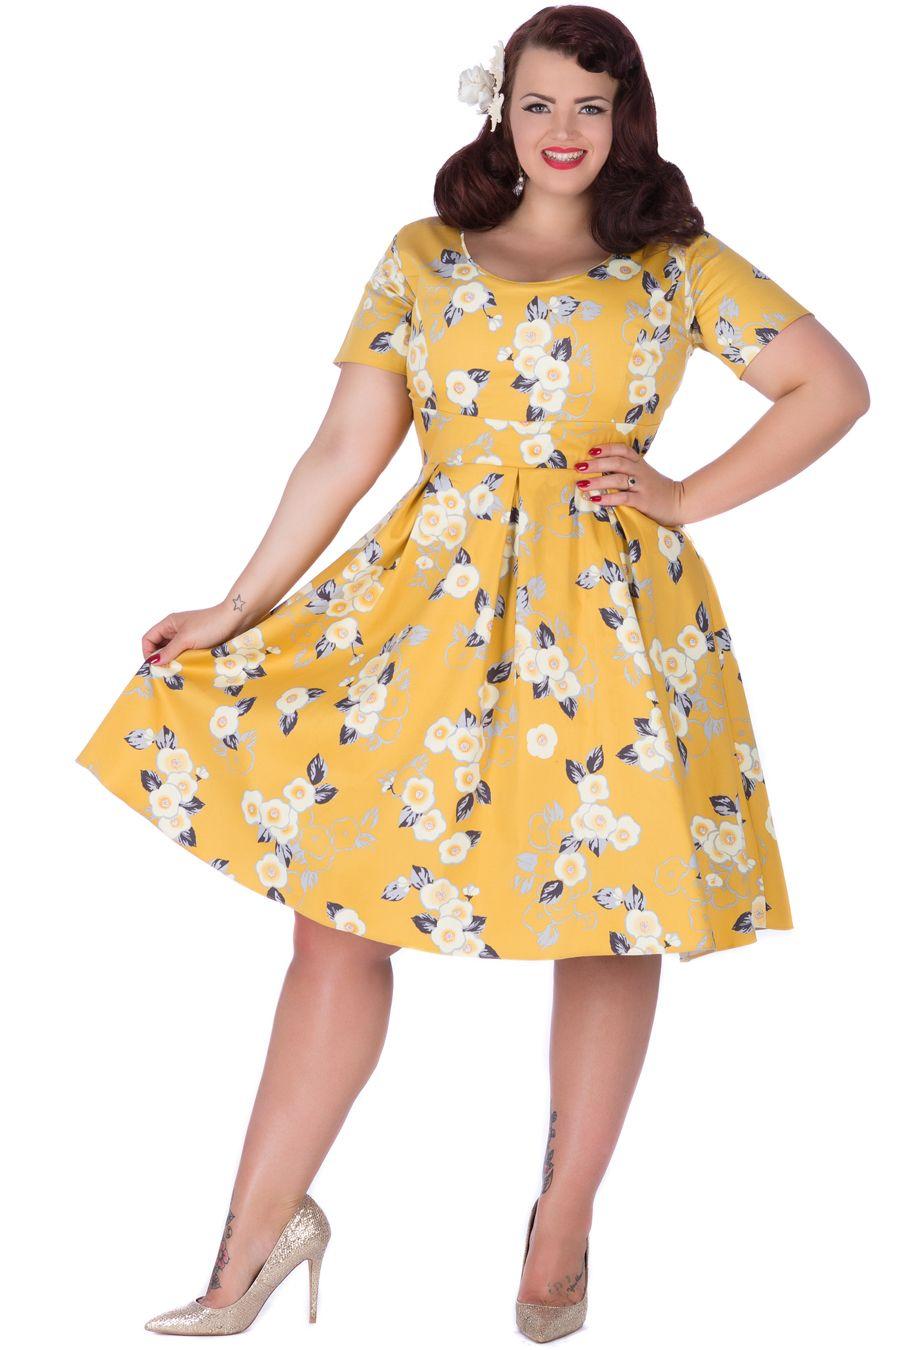 Yellow floral phoebe dress vintage style dresses for Plus size rockabilly wedding dresses